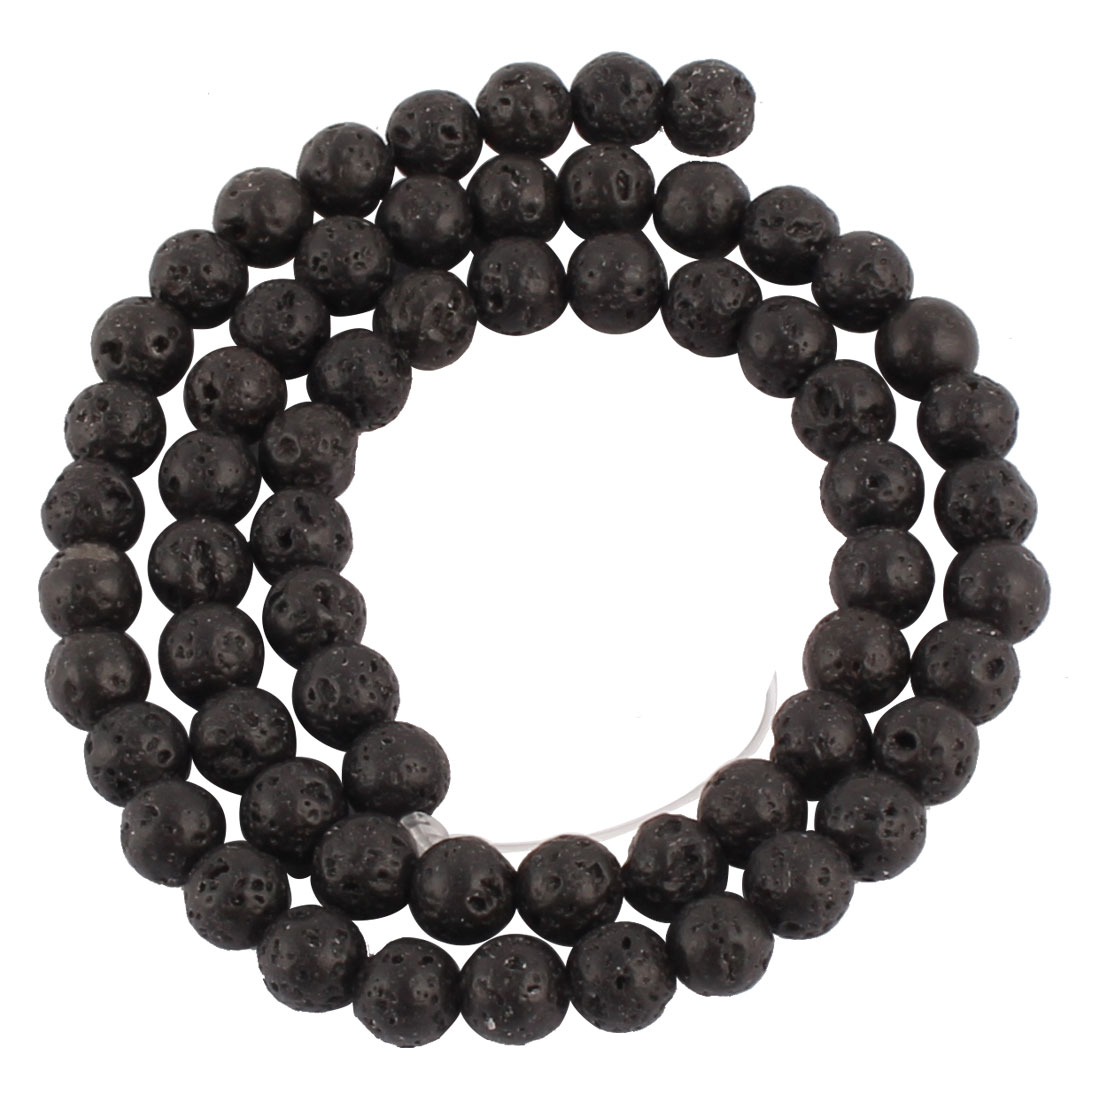 Lady Basalt Oval Shape Beads Multiaperture Necklace Black - image 2 of 2